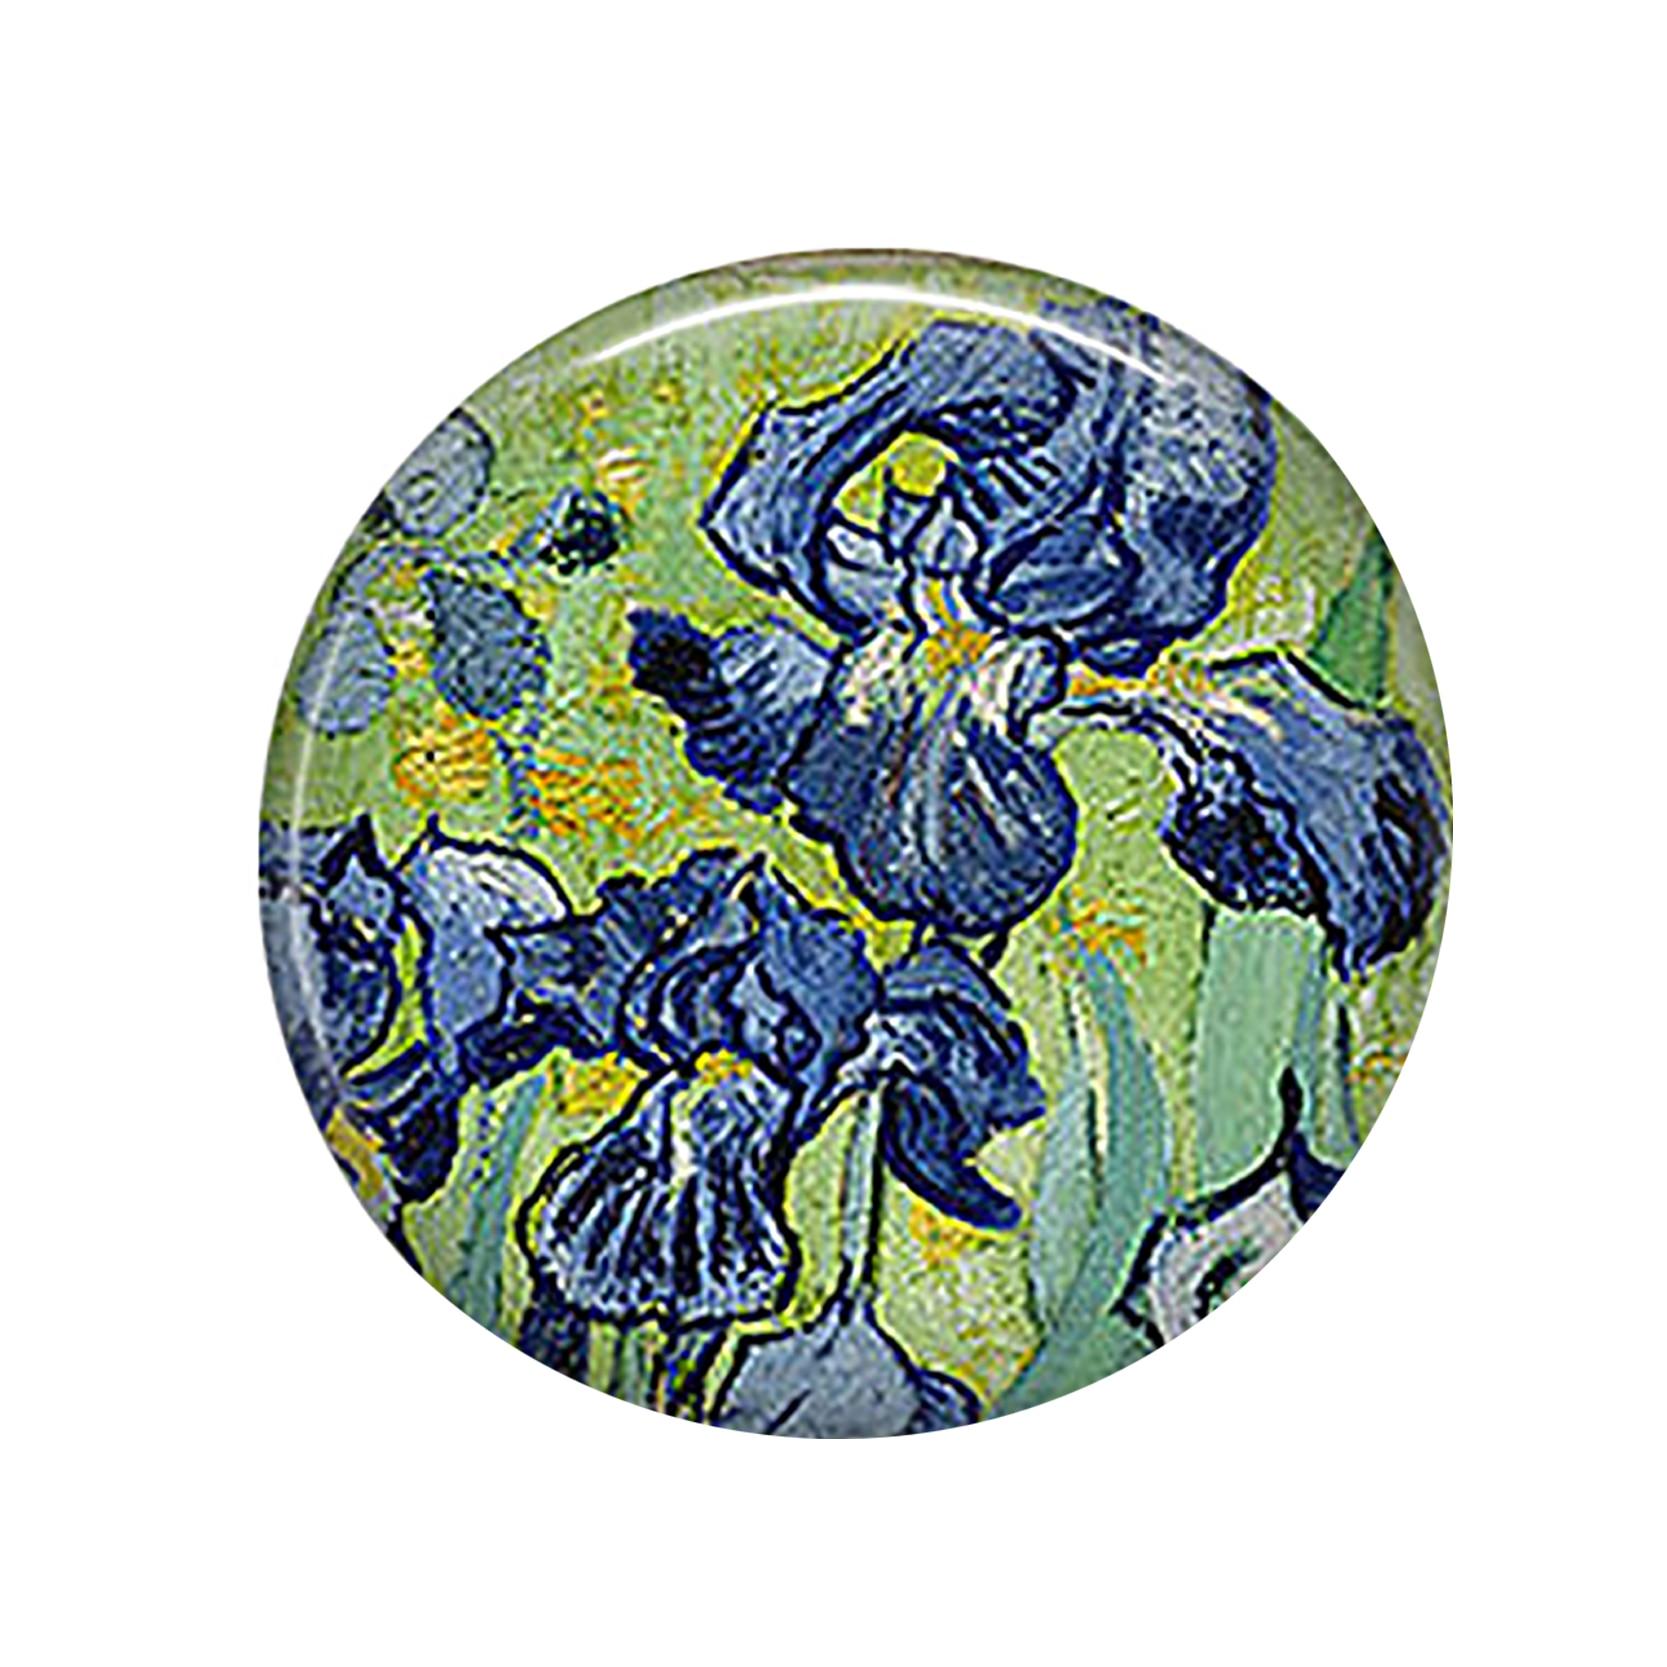 Van Gogh Irises Pendant Making 25mm Round Glass Cabochon Gemstone Jewelry Accessories заколки van gogh nadia wedding f226 page 1